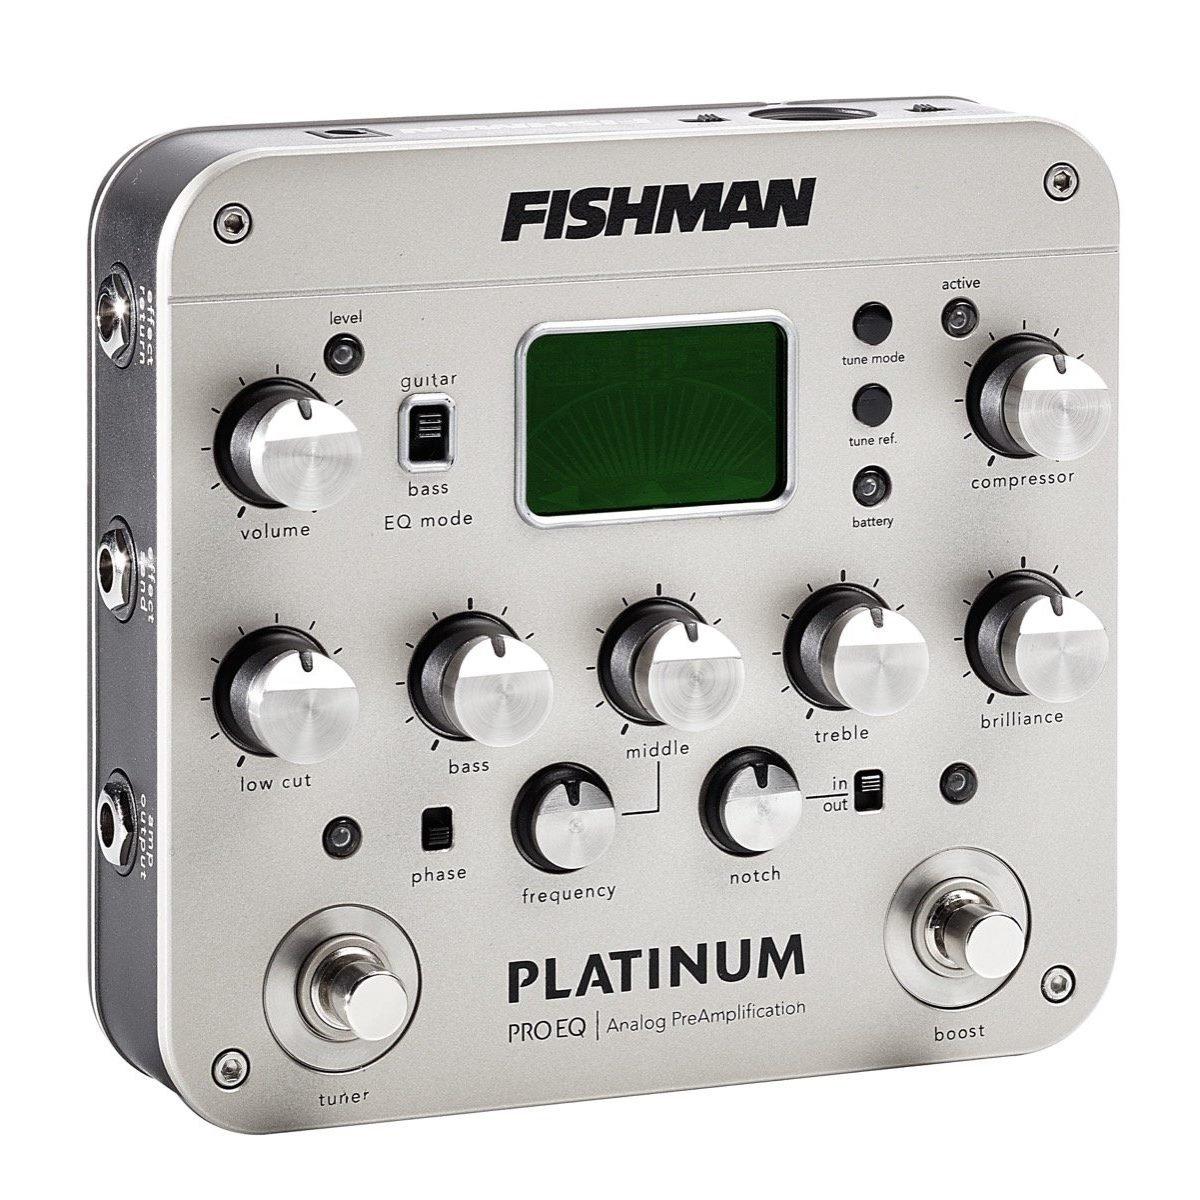 Fishman Platinum Pro EQ/DI Analog Preamp Fishman Transducers Inc. PRO-PLT-201